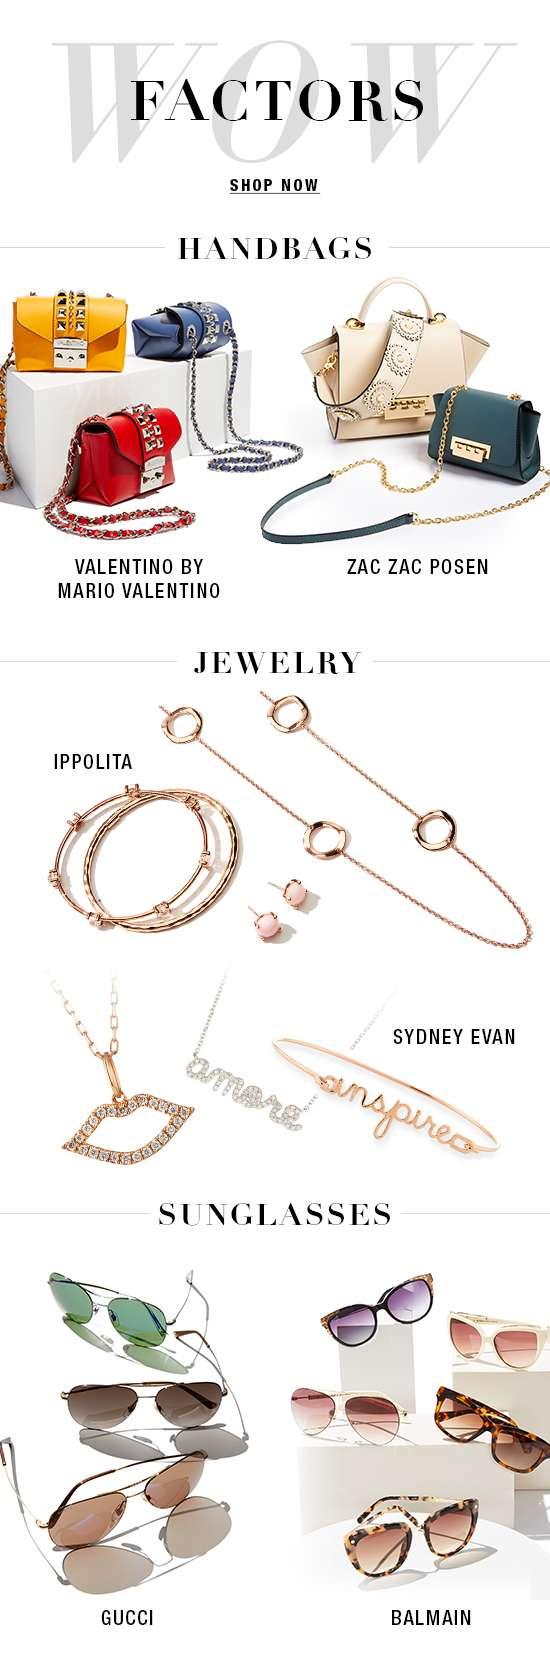 Handbags, jewelry, and sunglasses from designer brands